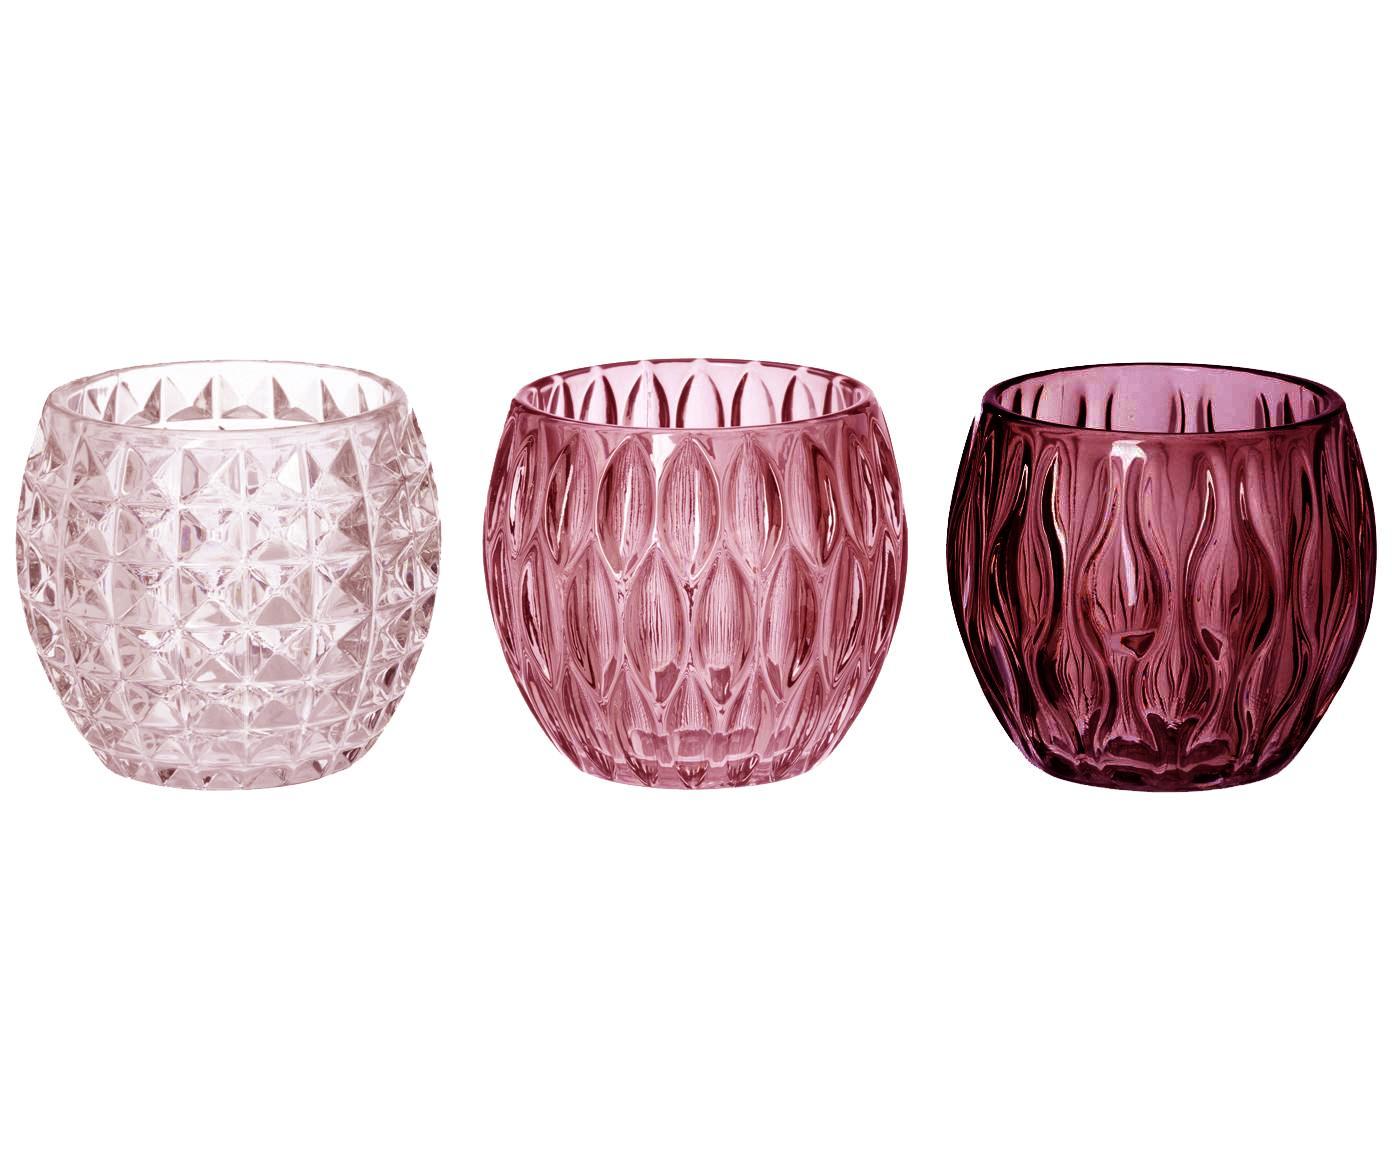 Set portacandele Aliza, 3 pz., Vetro, Rosa trasparente, Ø 10 x Alt. 9 cm